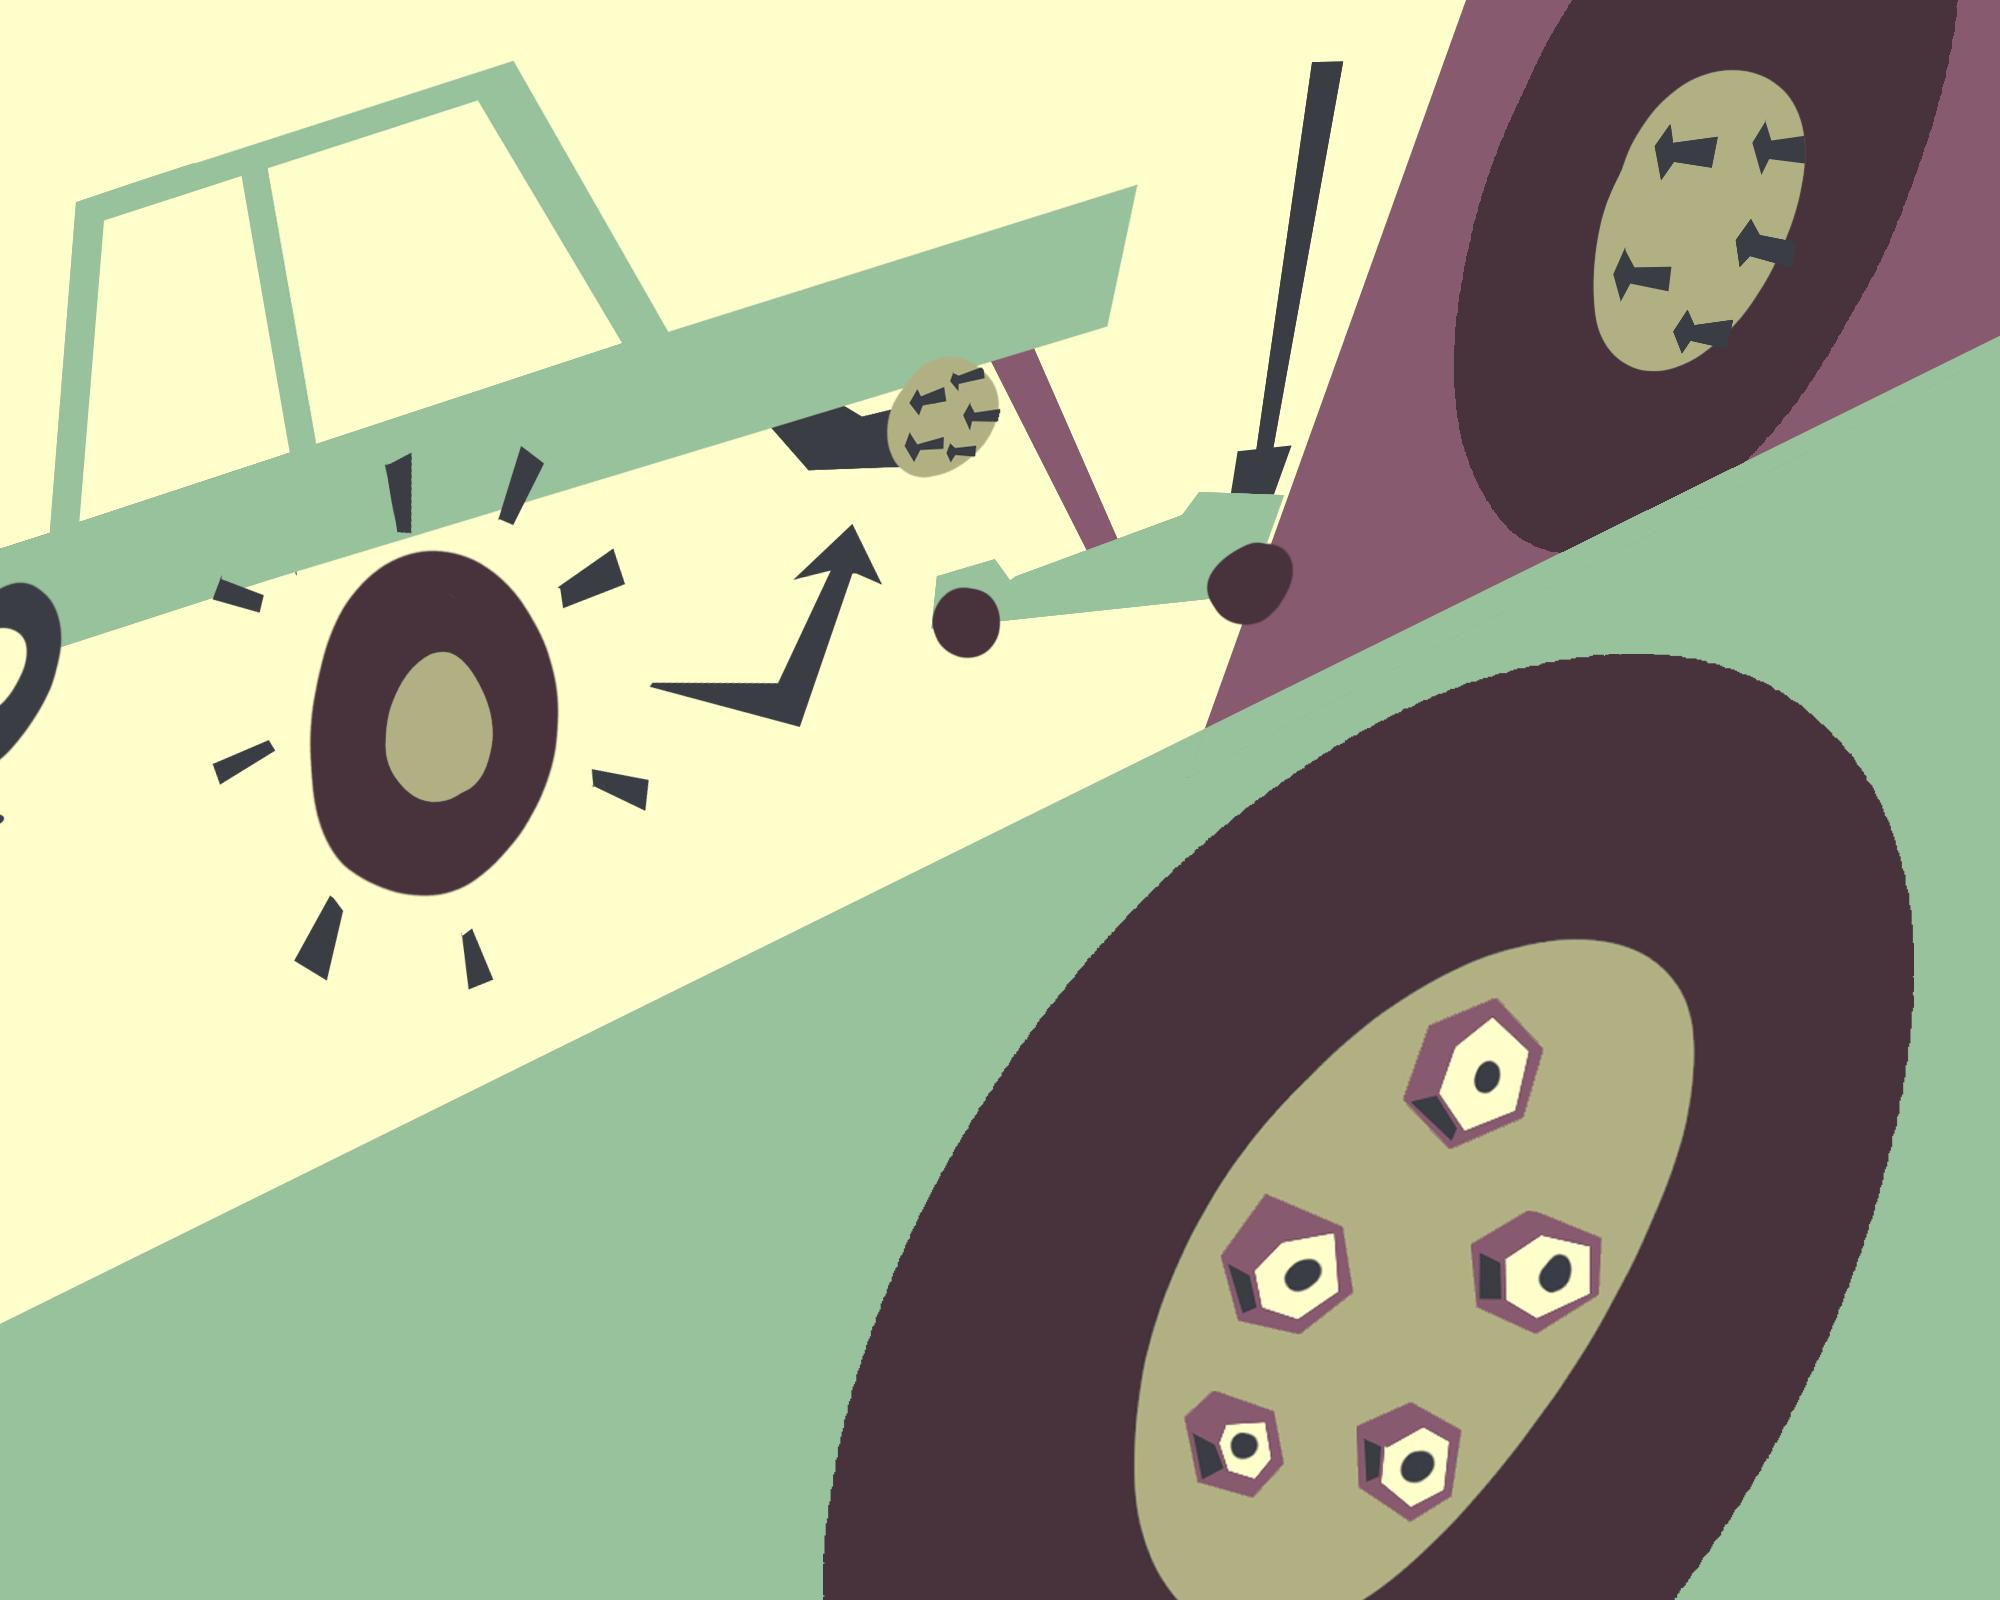 Change a tire: Align spare tire.